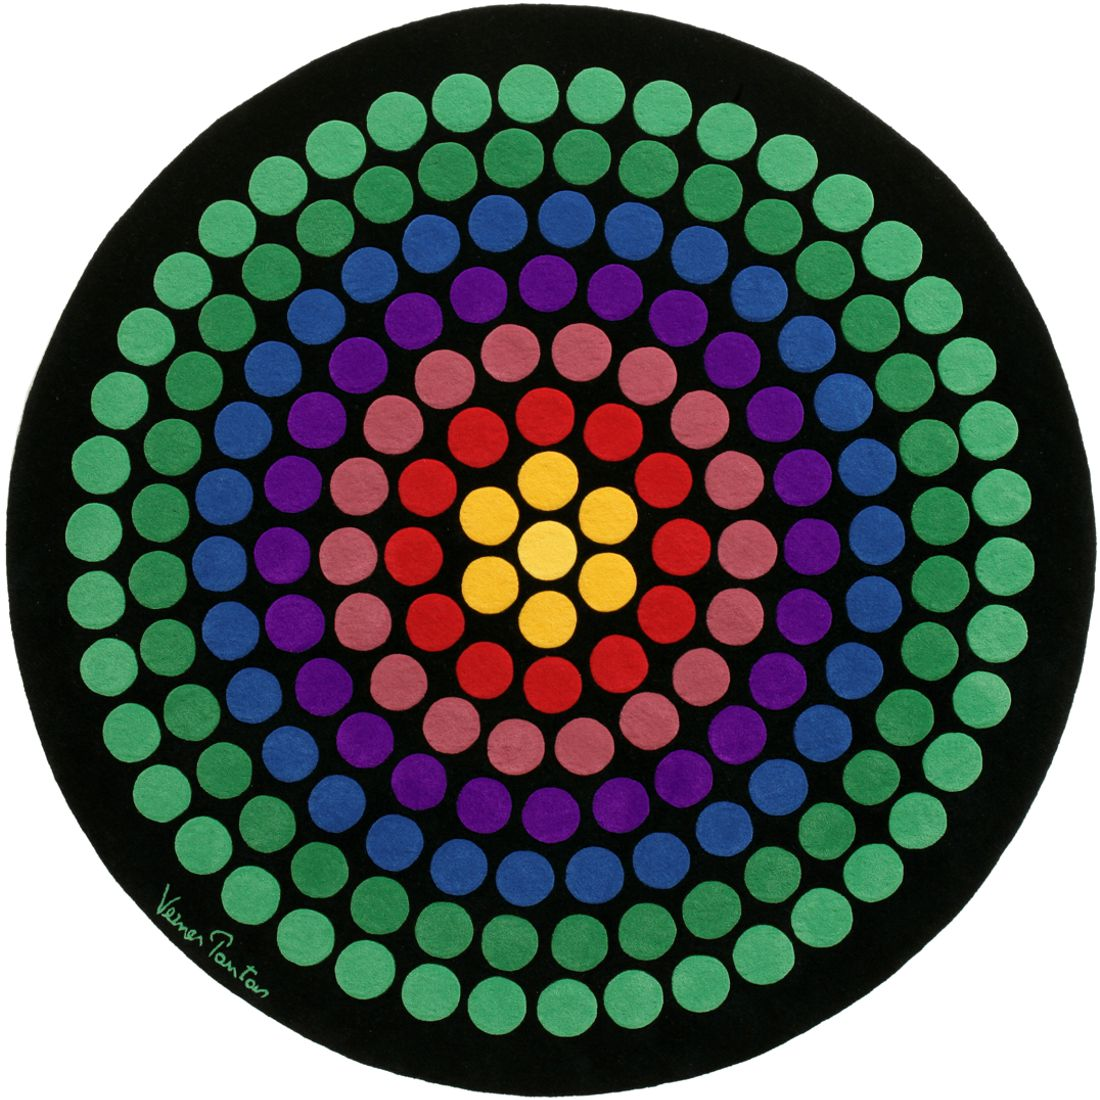 vp8 rund teppich rainbow designercarpets bunt verner panton. Black Bedroom Furniture Sets. Home Design Ideas